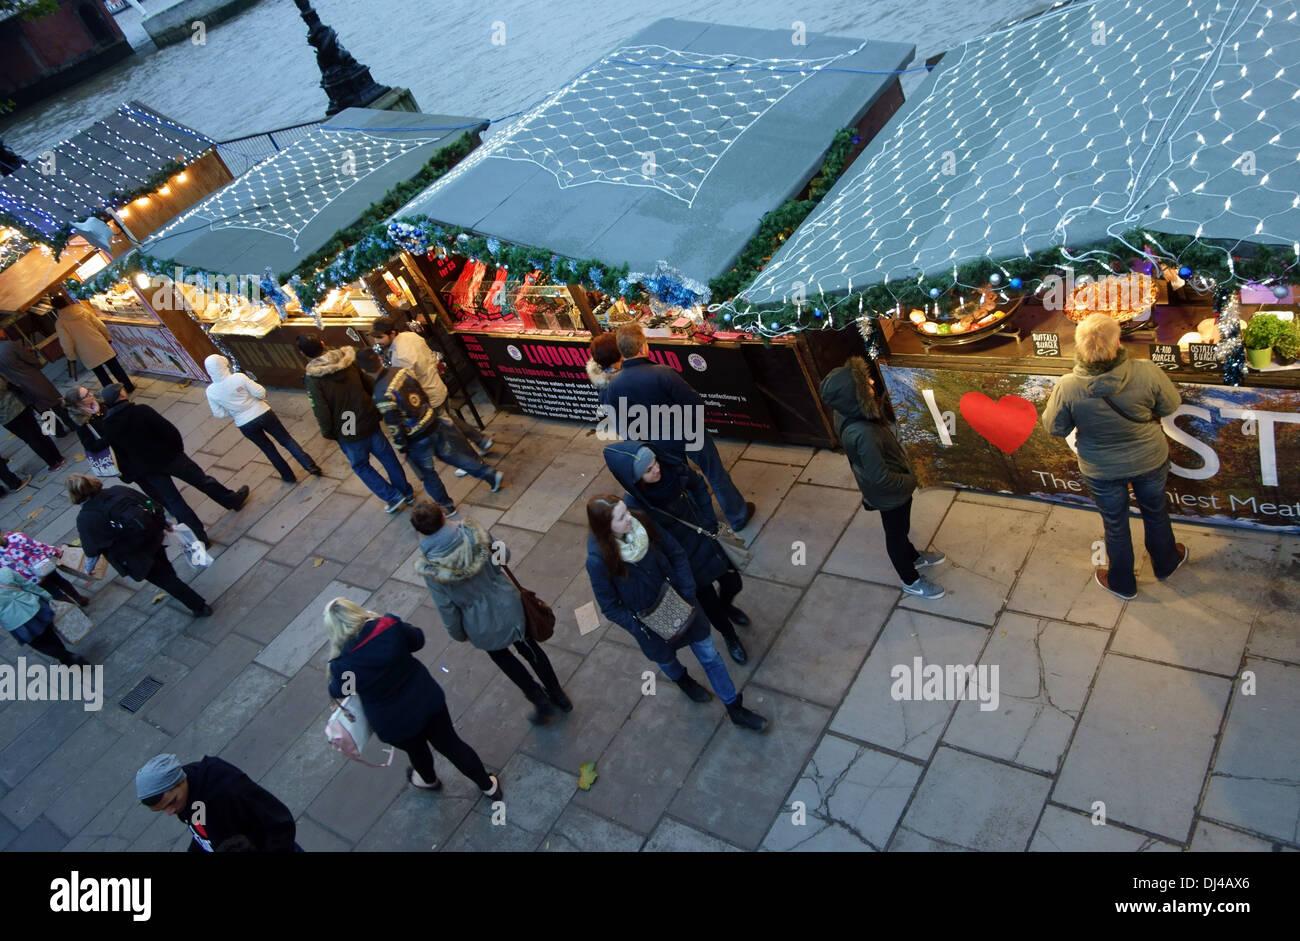 Christmas market on the South Bank, London - Stock Image